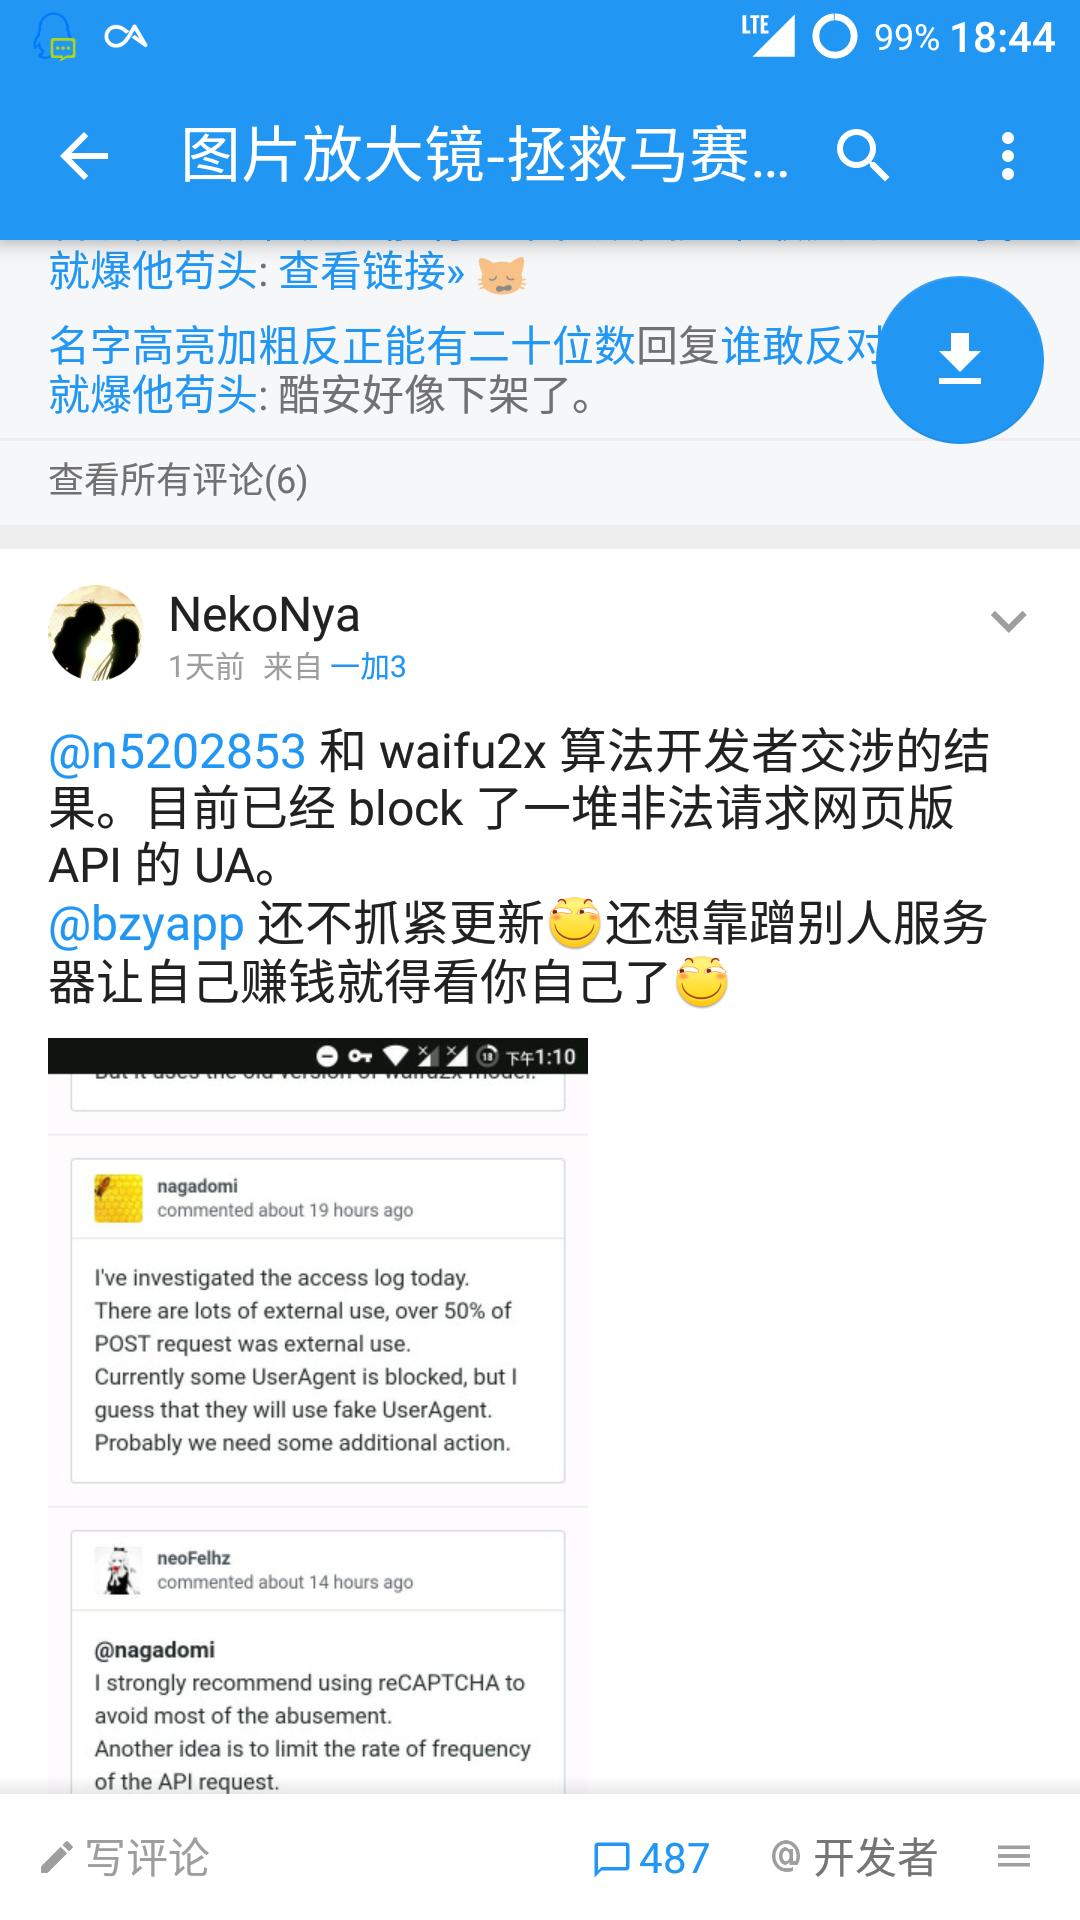 screenshot_20170728-184429